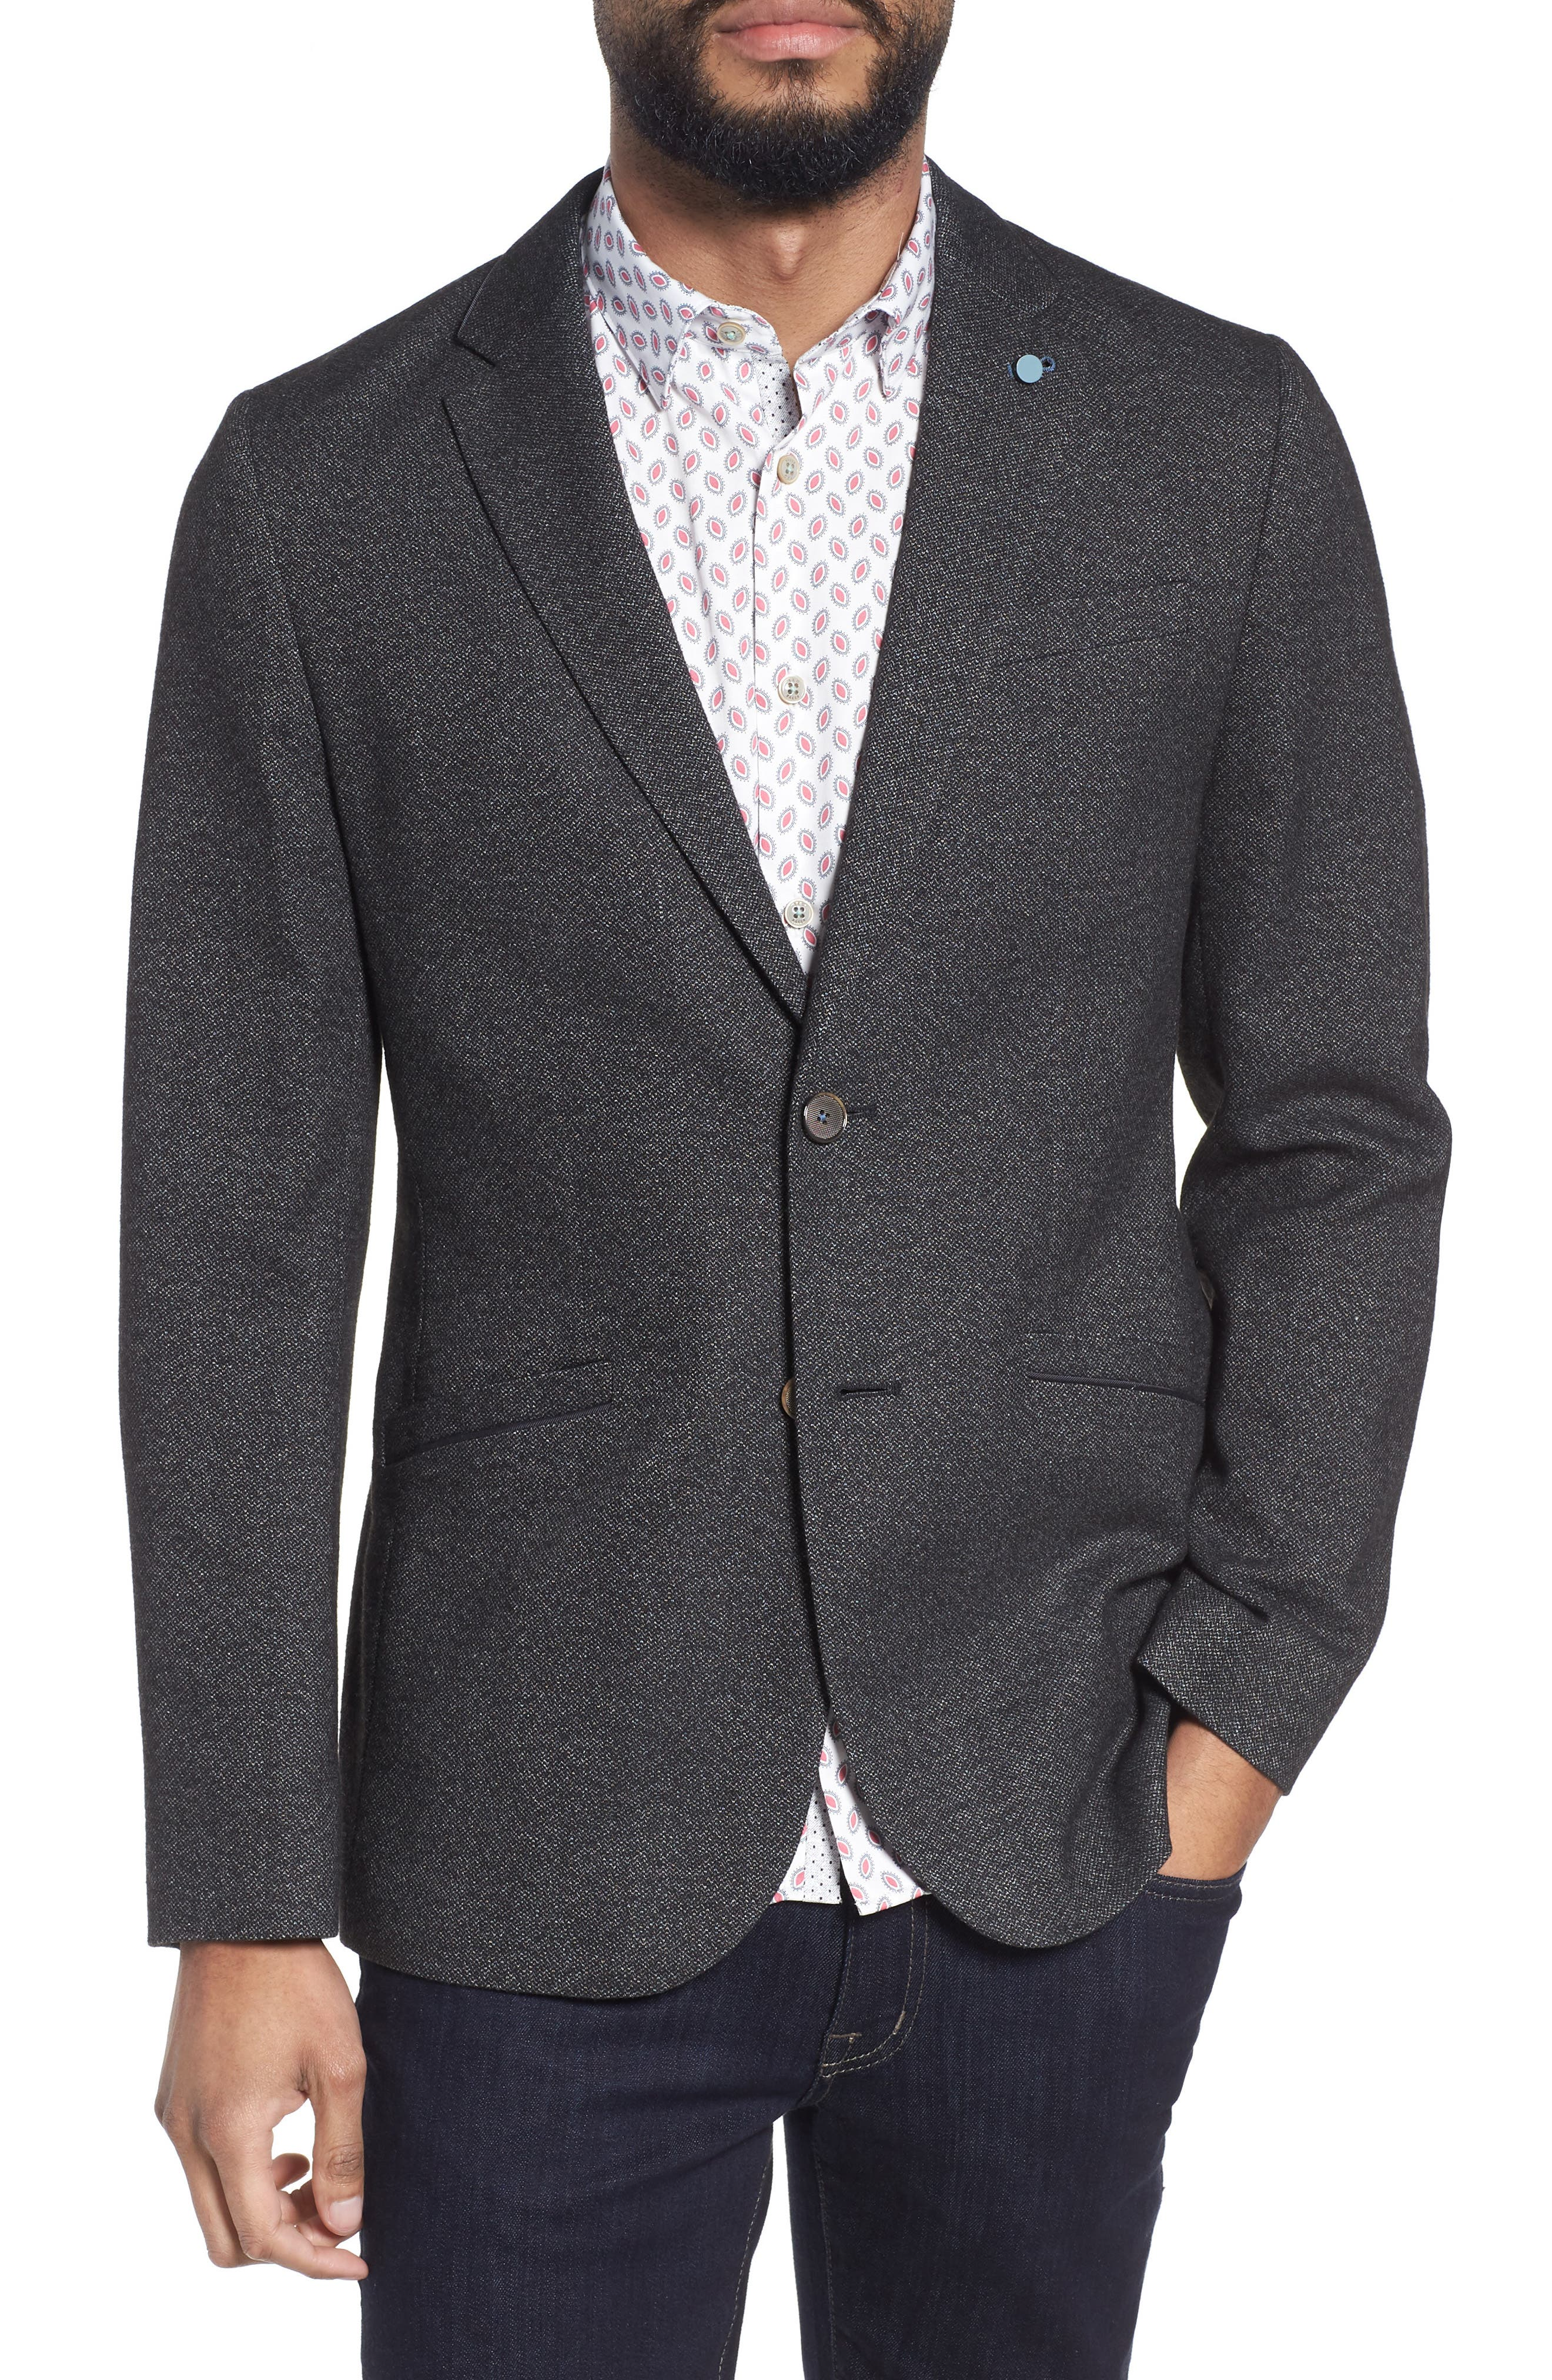 Beektt Semi Plain Trim Fit Jacket,                         Main,                         color, Charcoal